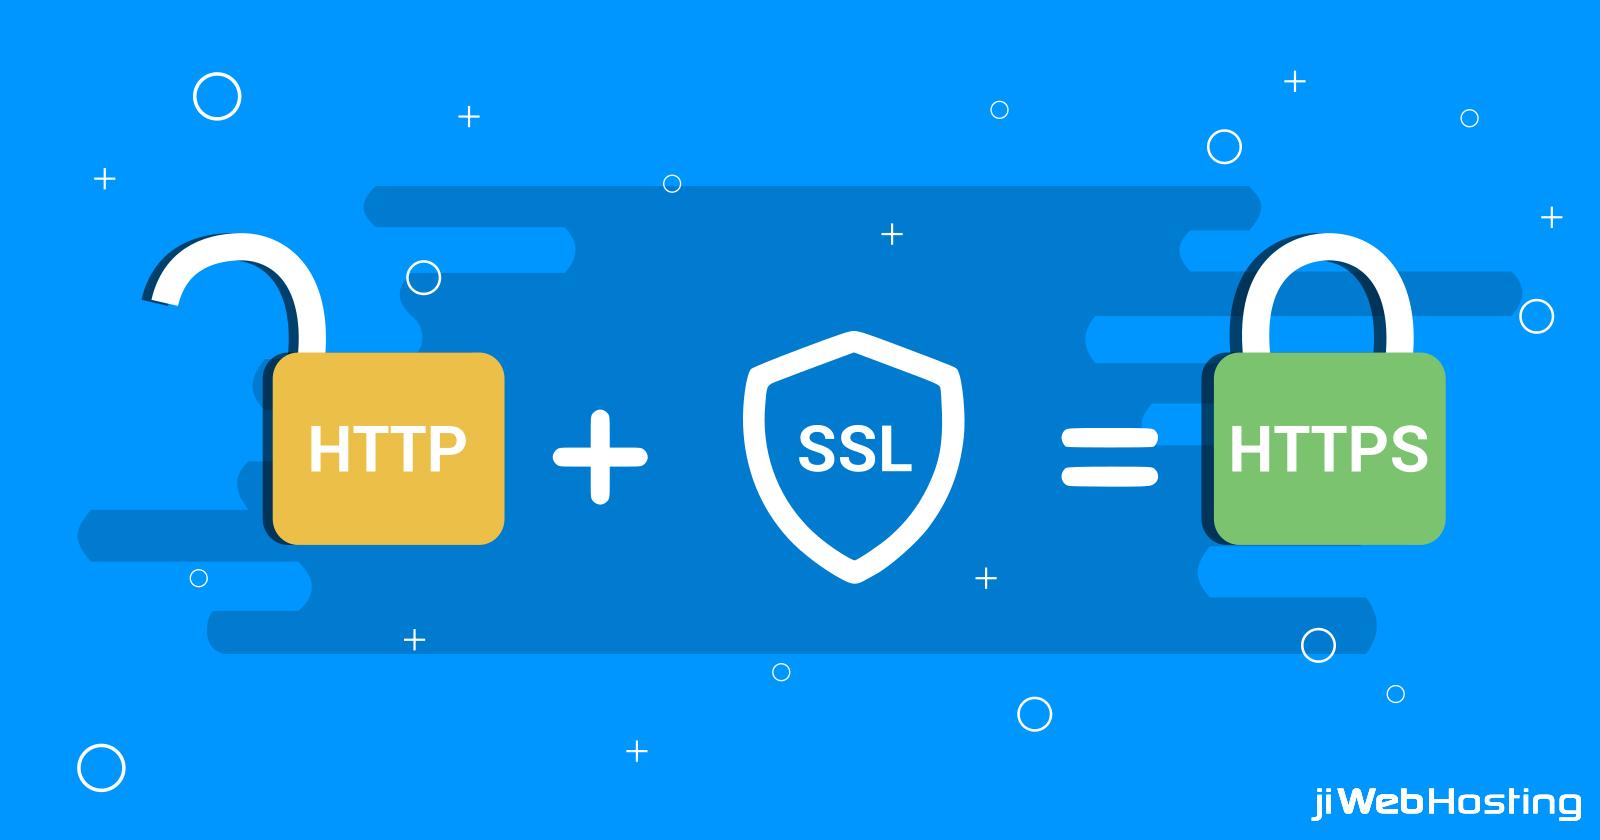 How to Setup SSL on your Server?